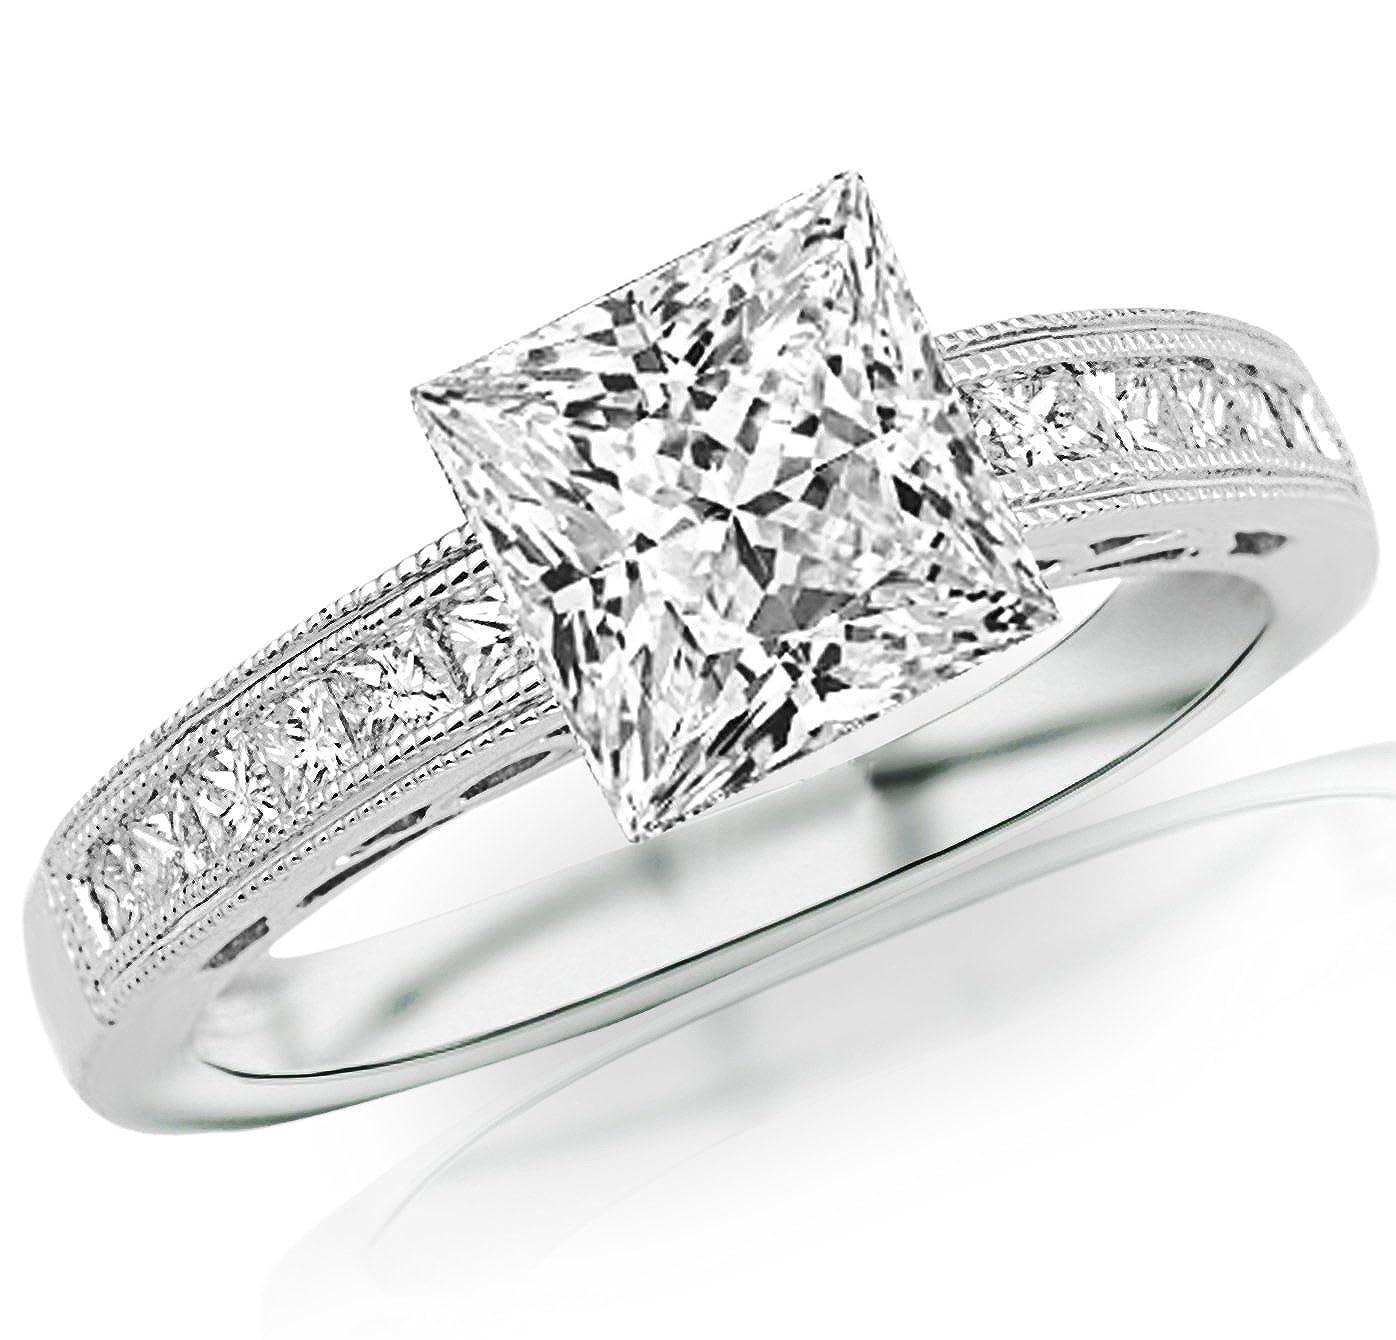 92a63a2bbb58b Houston Diamond District 2 Carat 14K White Gold Channel Set Princess Cut  Diamond Engagement Ring with Milgrain with a 1.6 Carat Moissanite Center